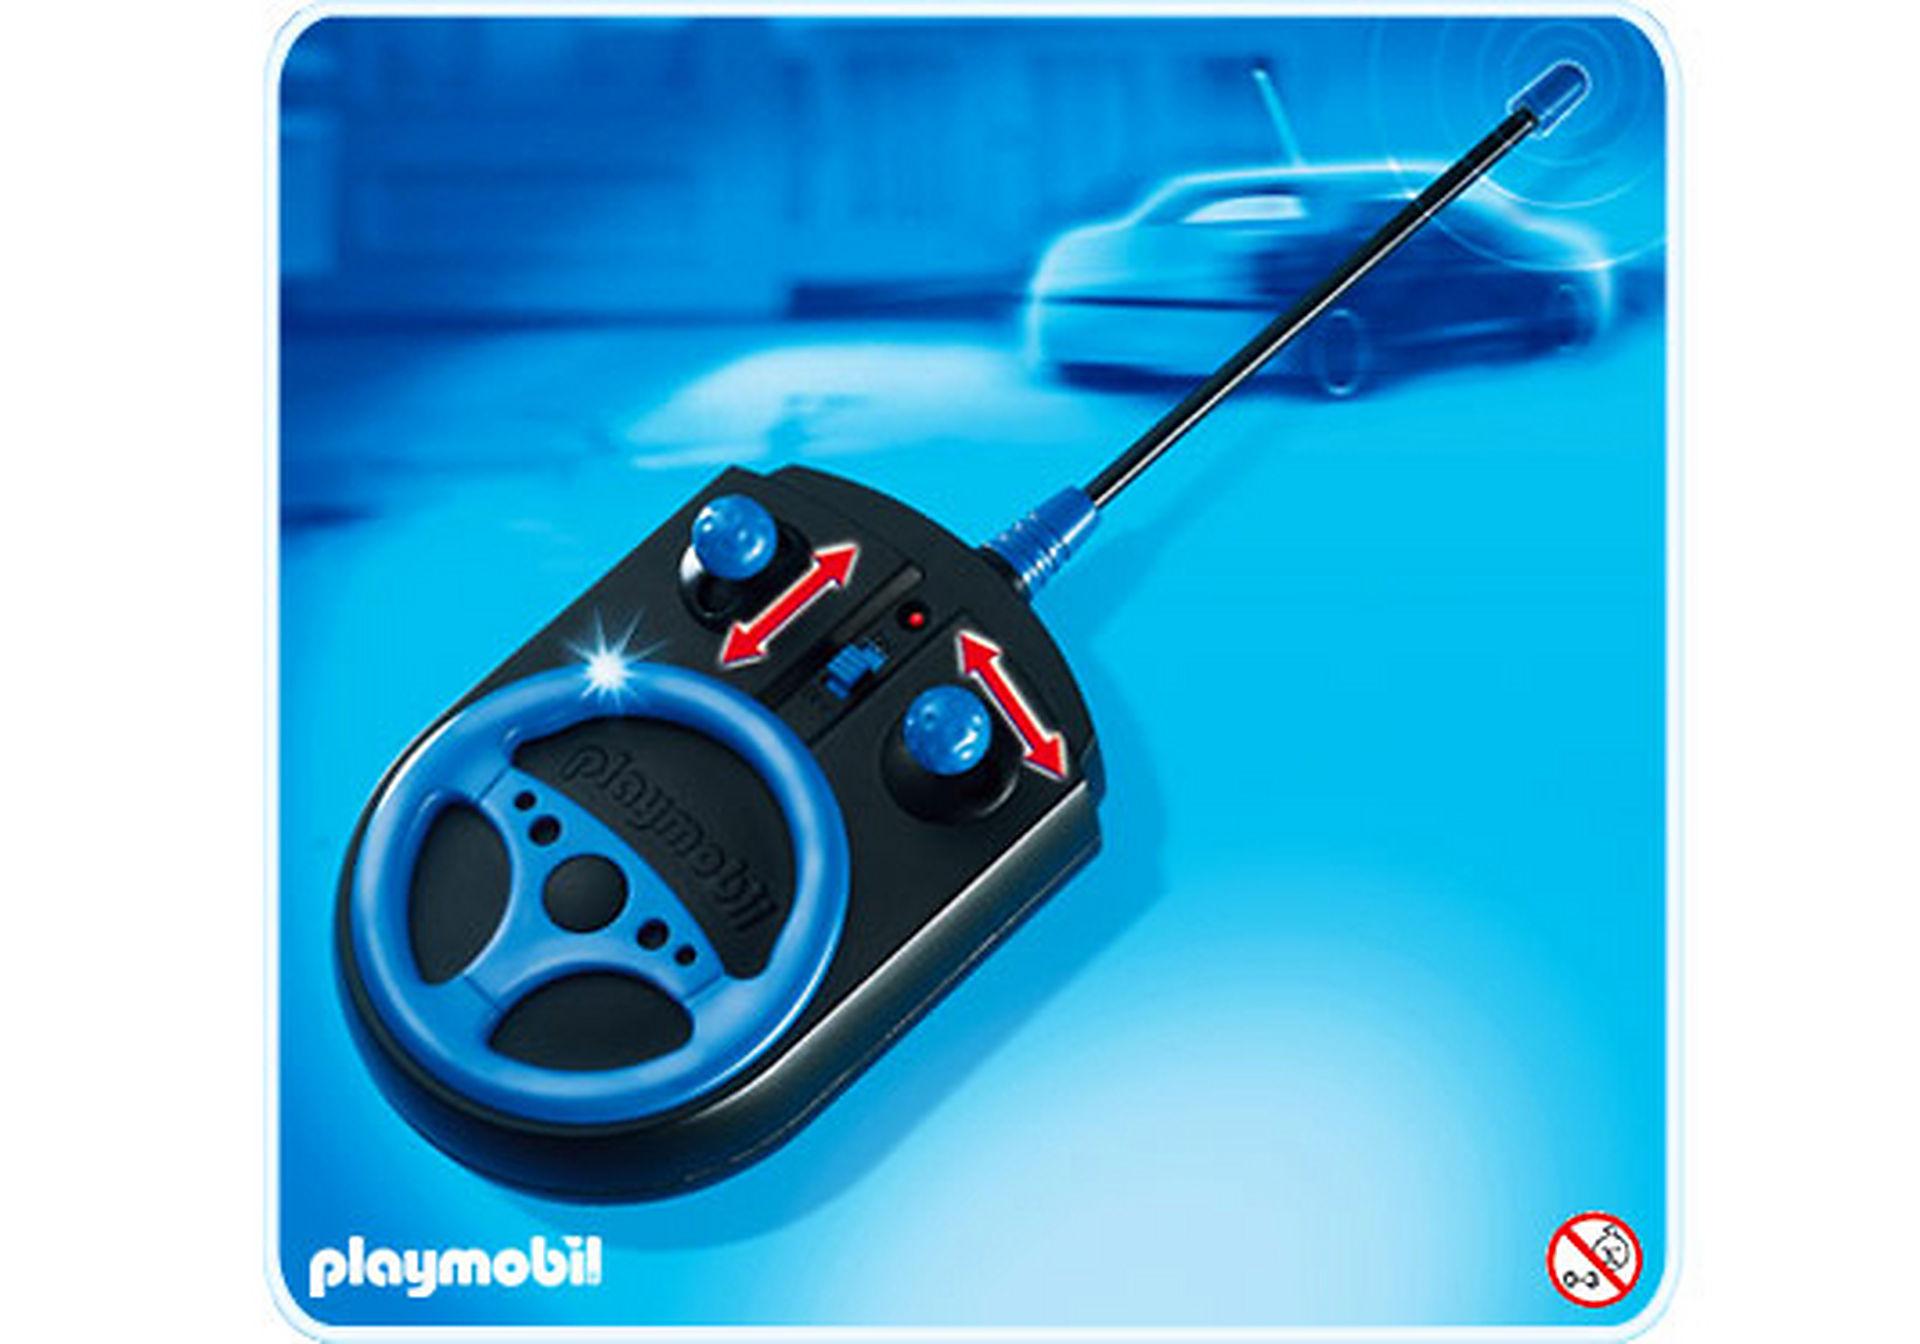 http://media.playmobil.com/i/playmobil/4320-A_product_detail/Module de radiocommande compact